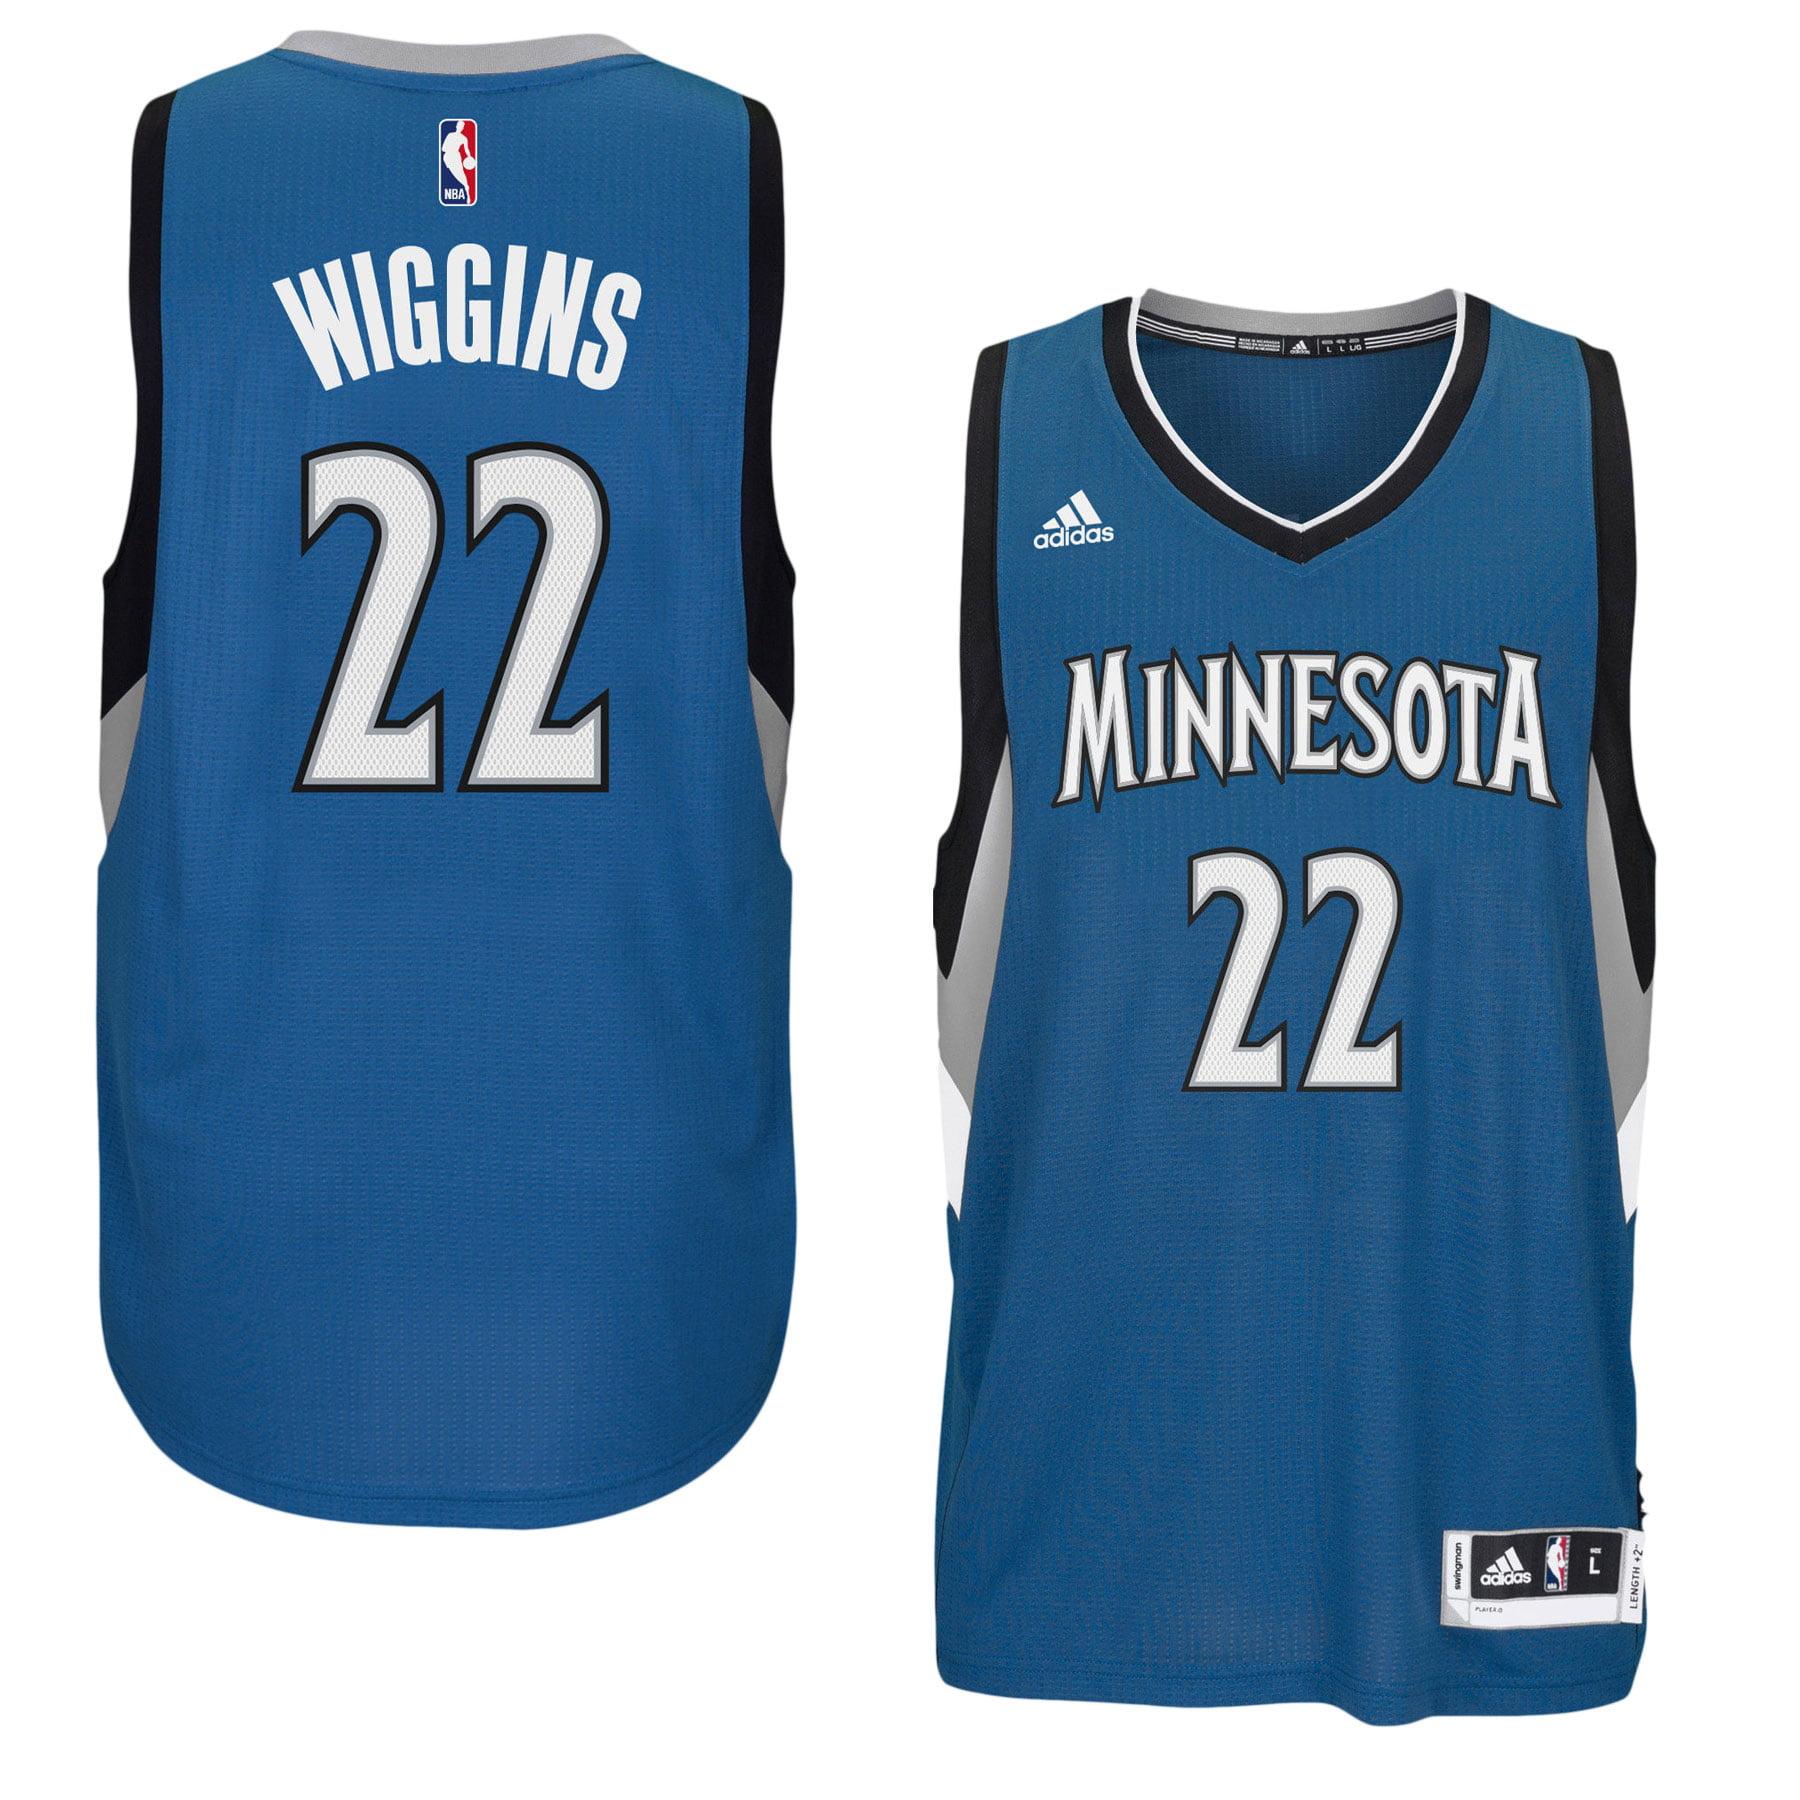 buy popular 65a69 2e6bc Andrew Wiggins Minnesota Timberwolves NBA Swingman Road ...